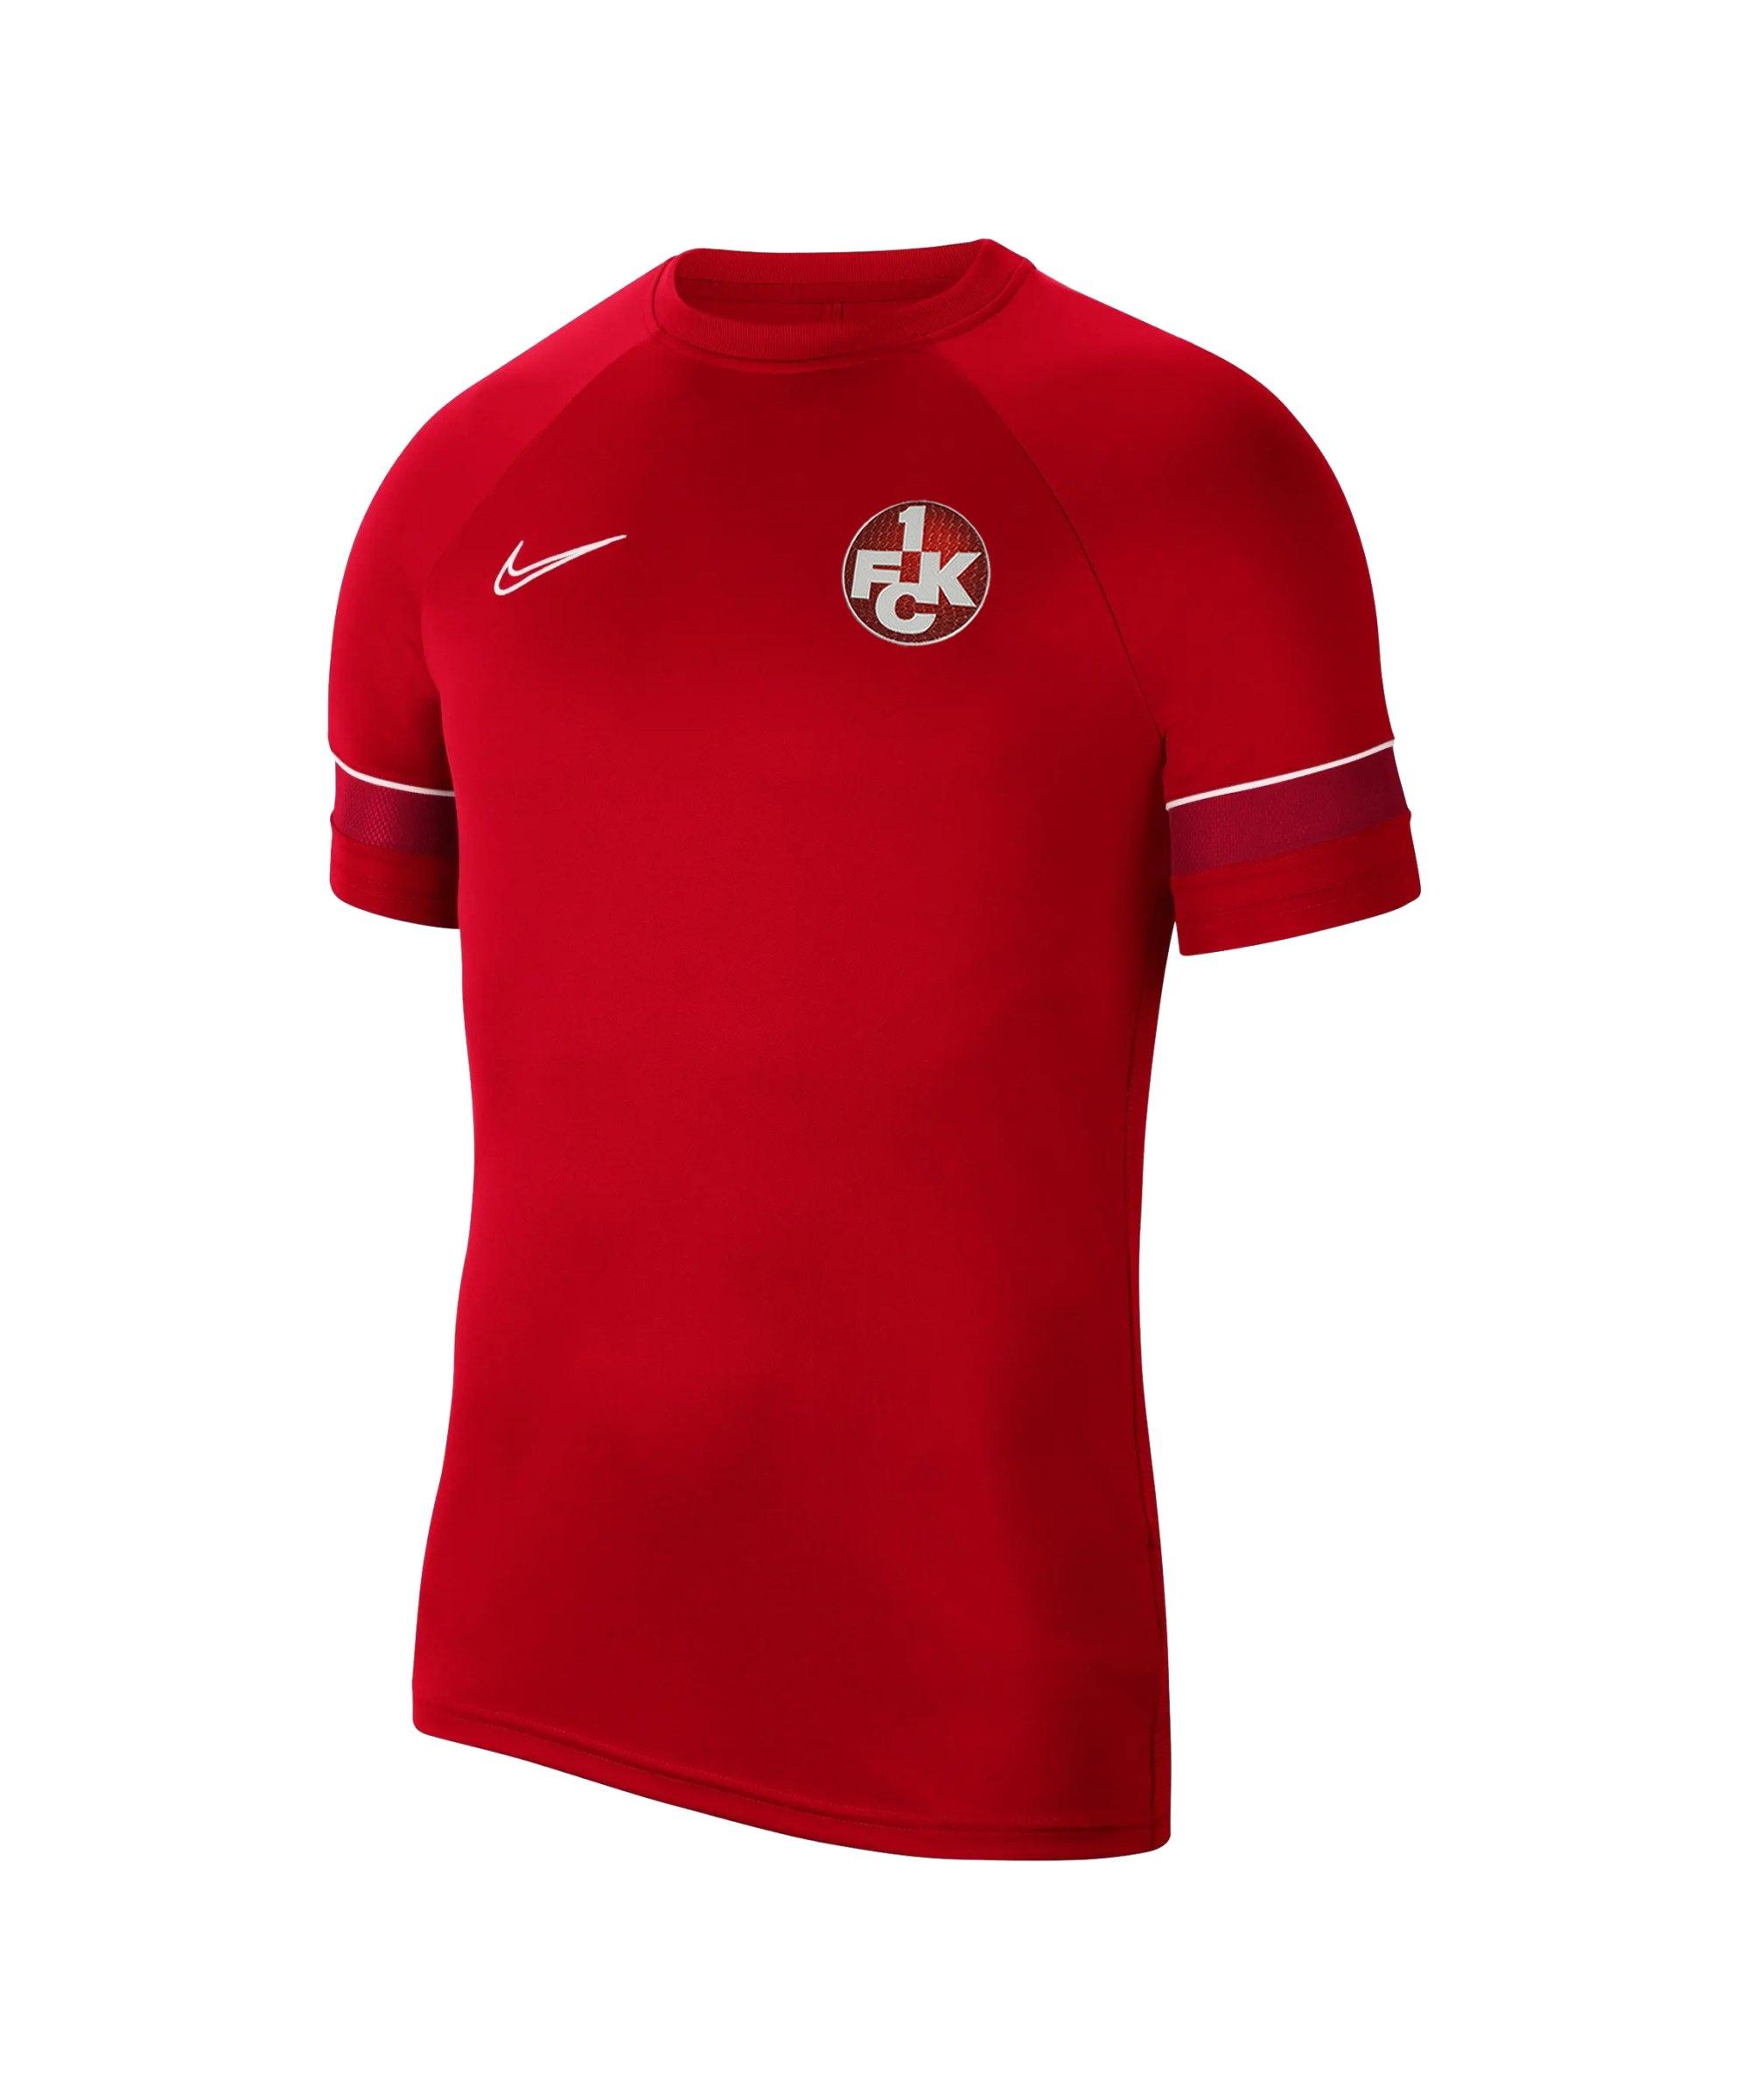 Nike 1. FC Kaiserslautern Trainingsshirt Kids F657 - rot